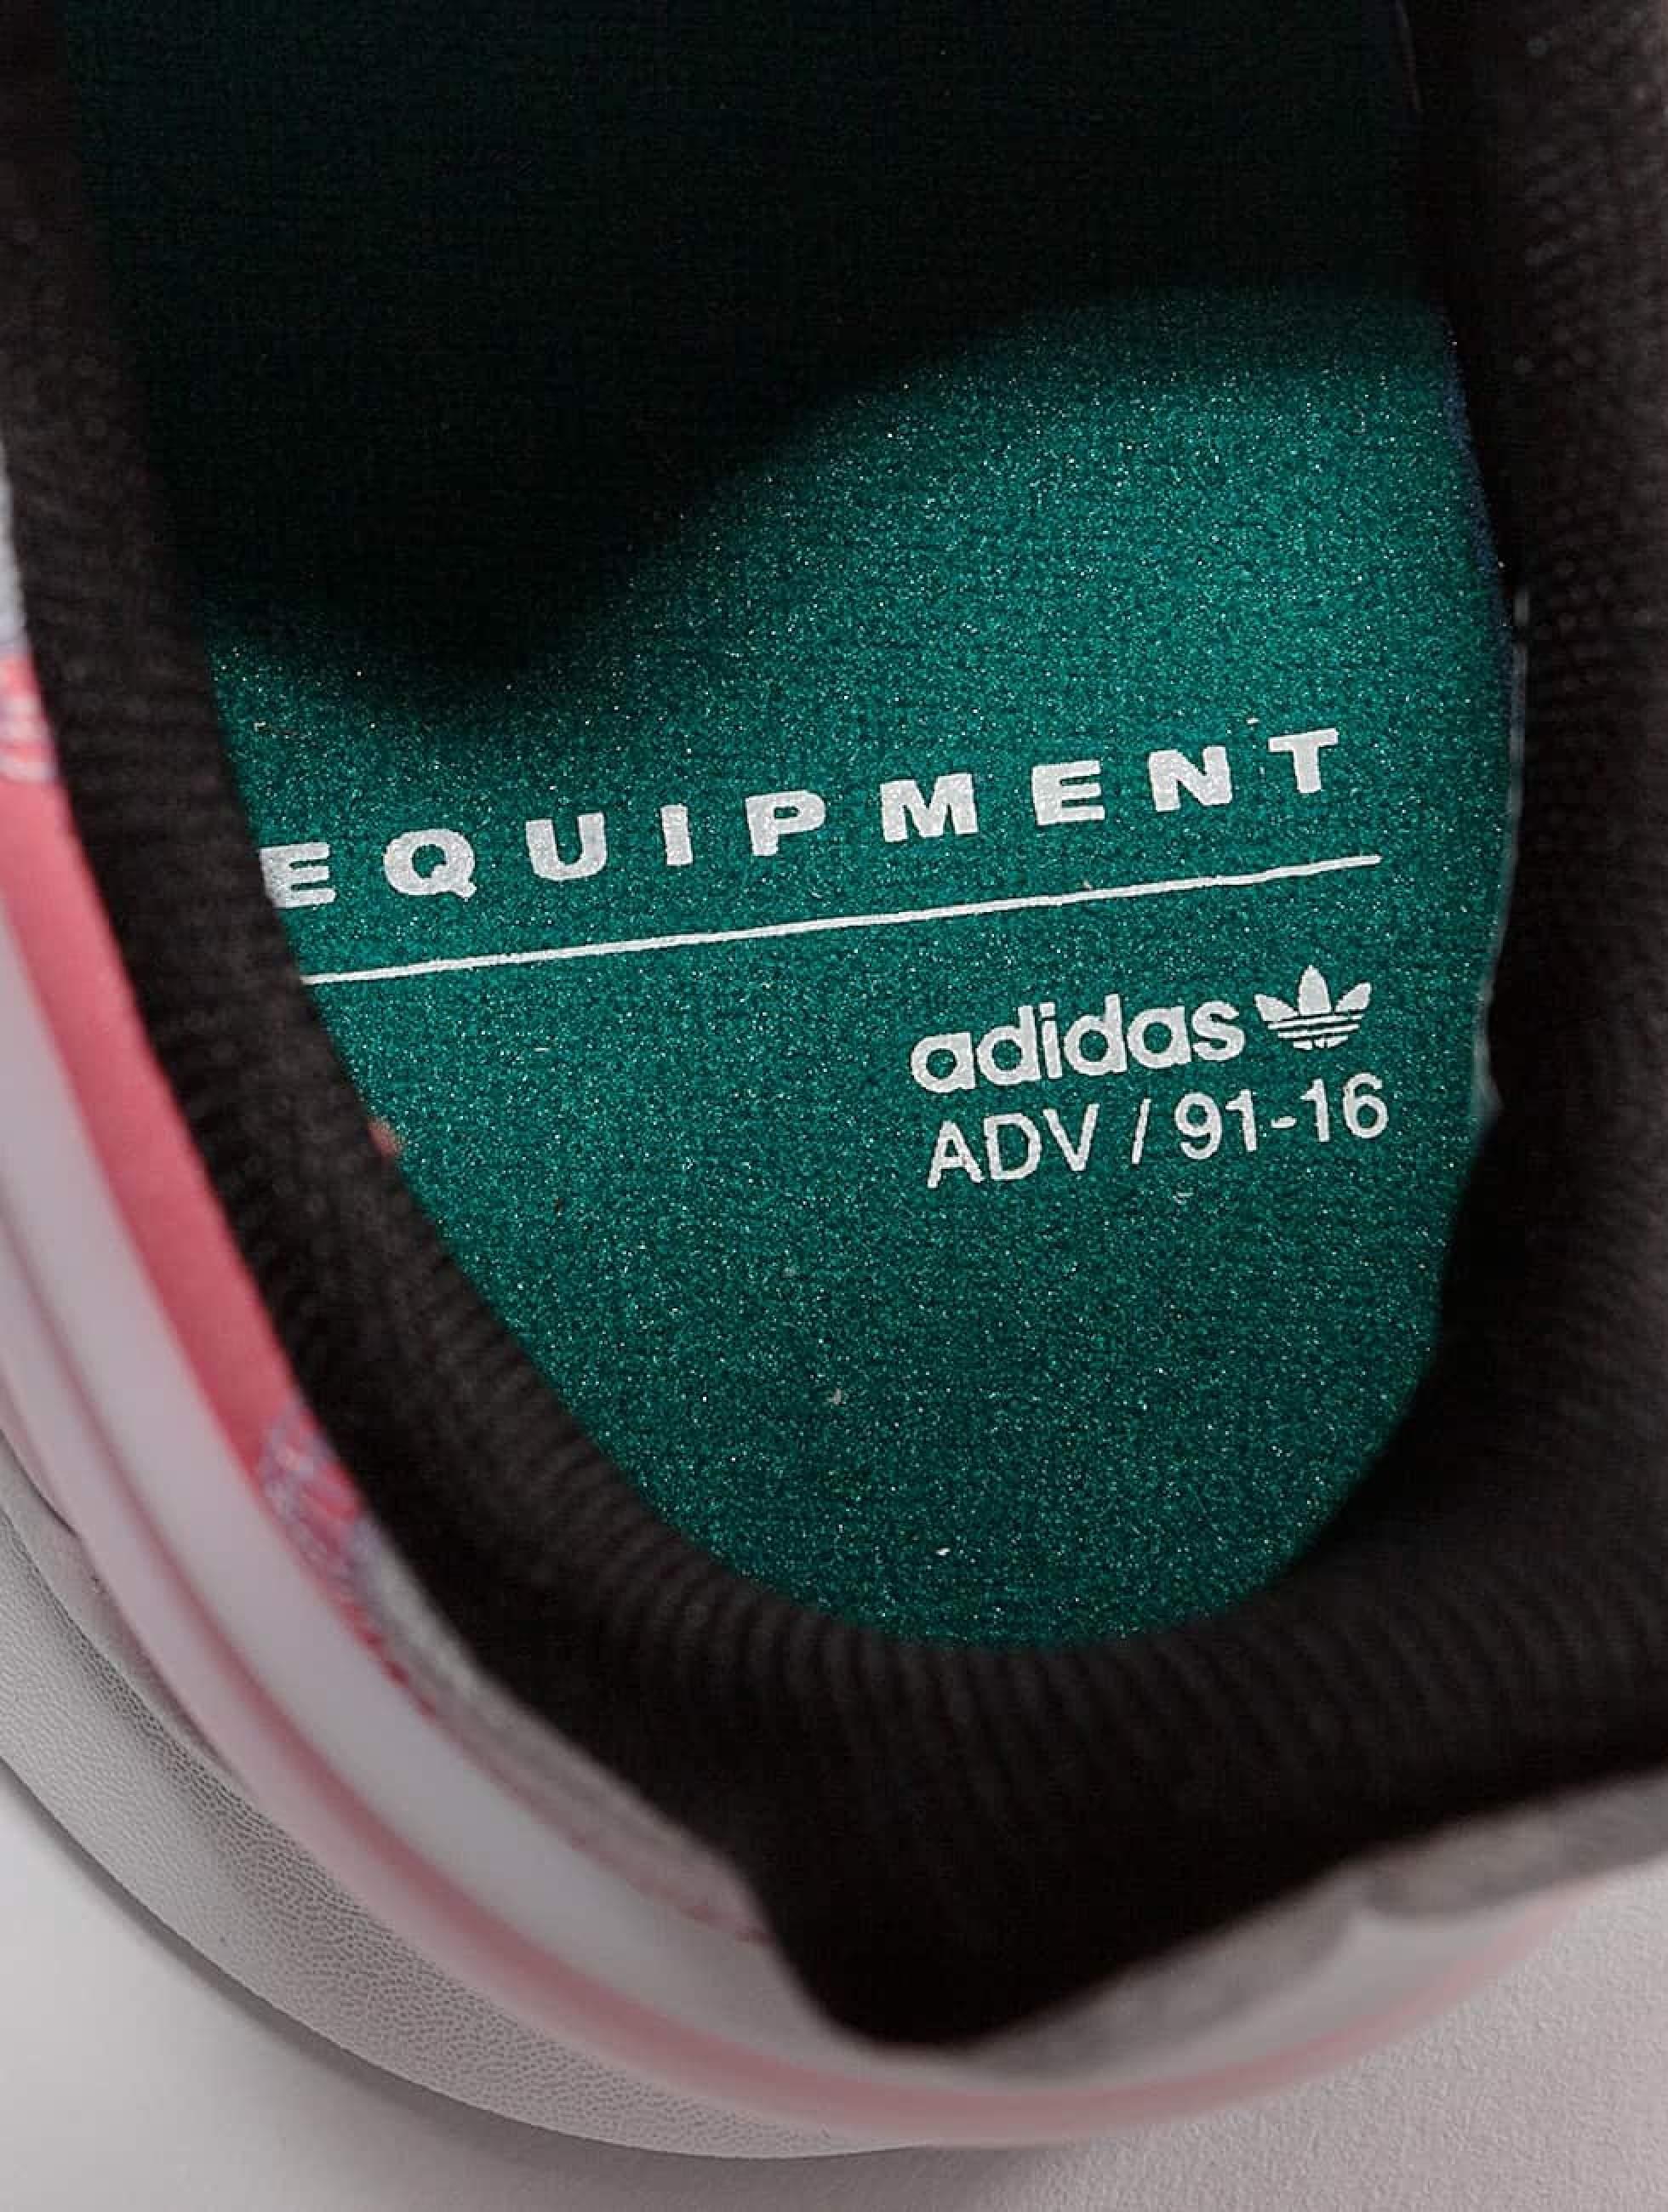 adidas originals Damen Schuhe / Sneaker Eqt Support Adv